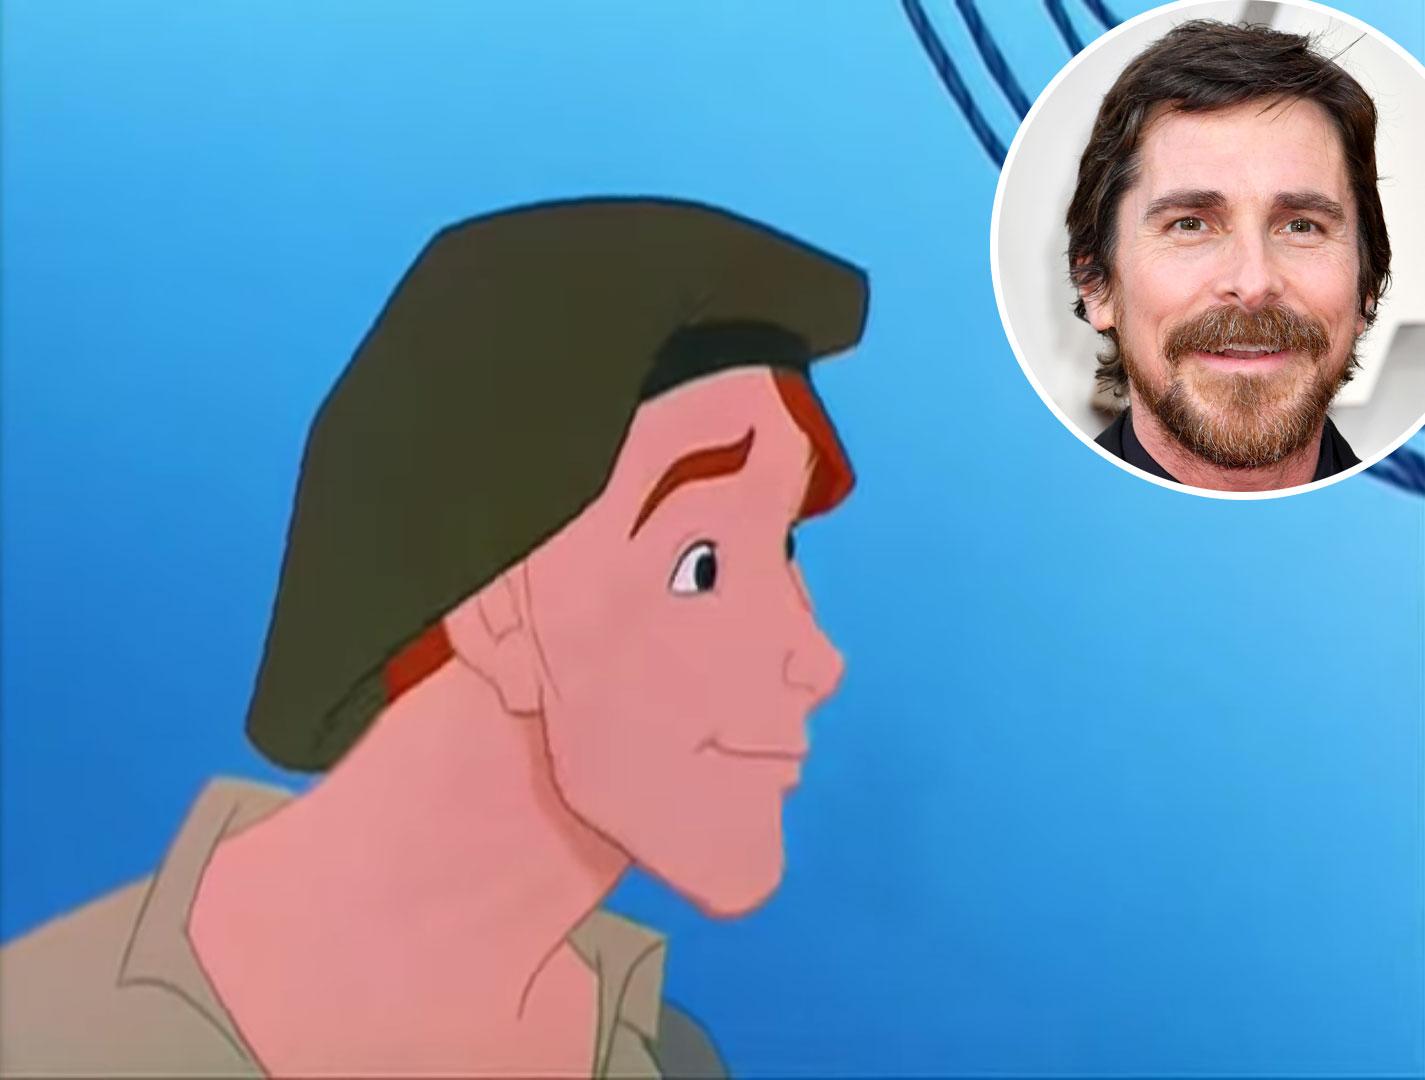 Christian Bale Pocahontas Thomas Voice Over Disney and Pixar Characters - Thomas in Pocahontas (1995)